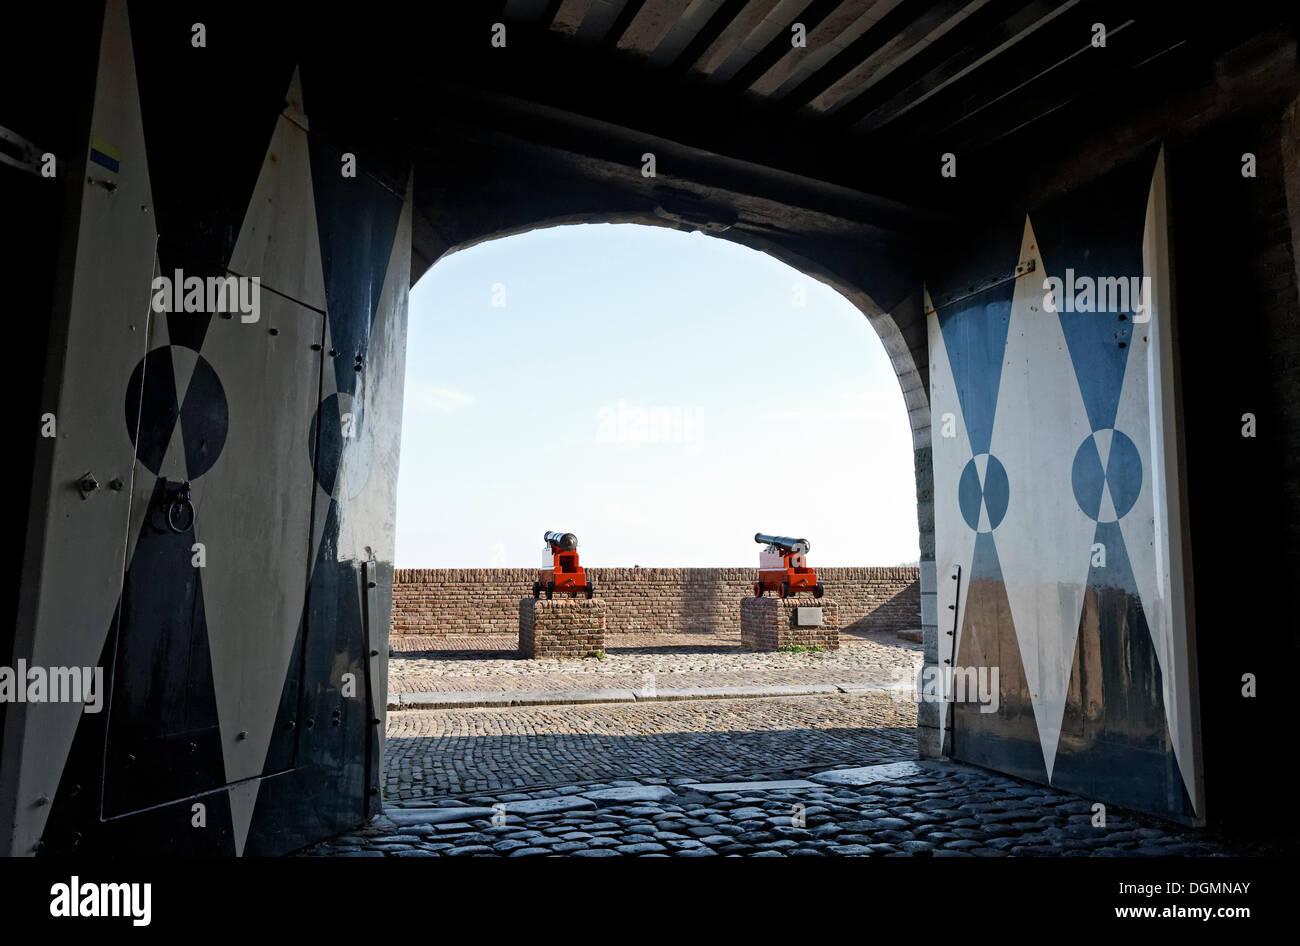 Le pistole di fronte al Campveerse Toren torre di difesa, la storica città di Veere, Walcheren, Zeeland, Paesi Bassi, Europa Immagini Stock